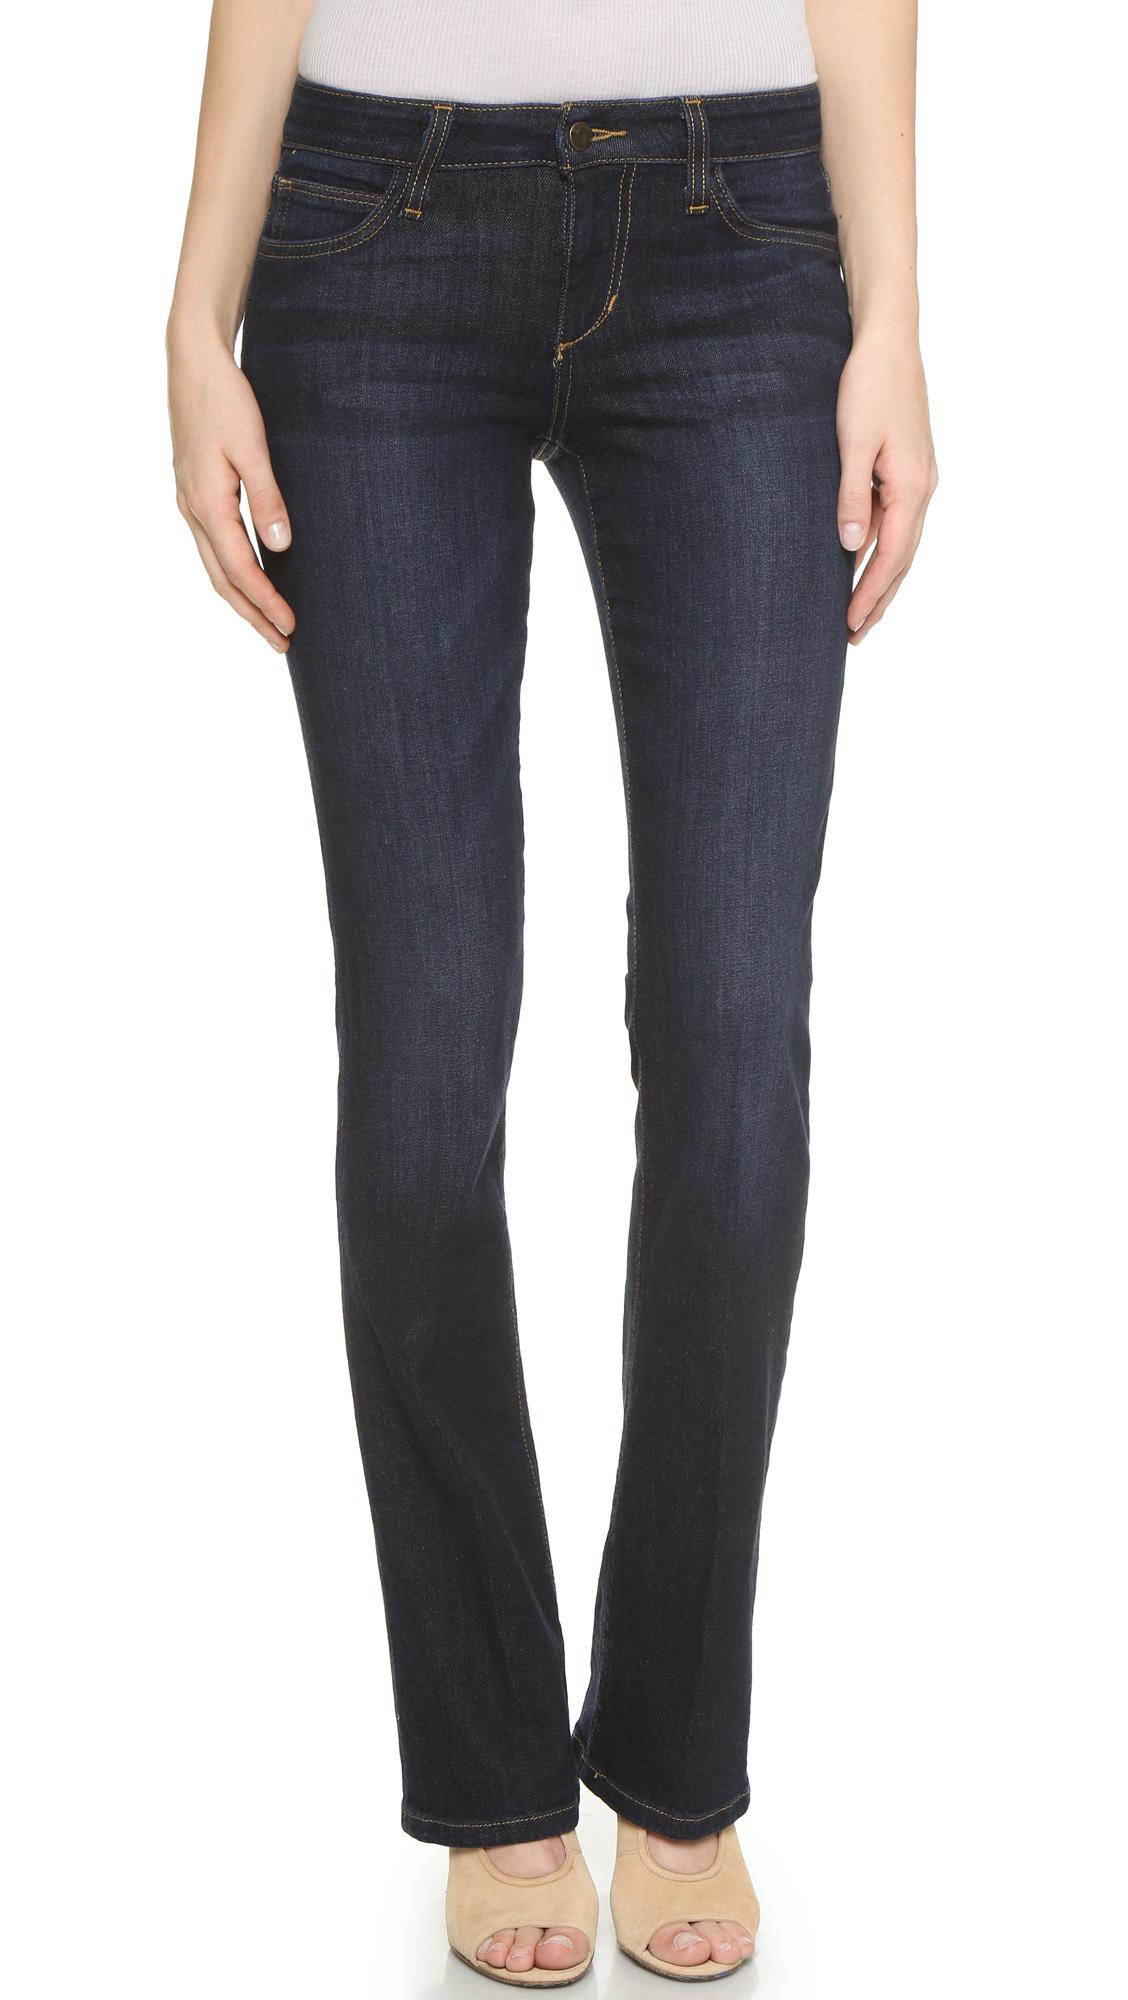 Joes Jeans Honey Curvy Fit Boot Cut Jeans - Rikki